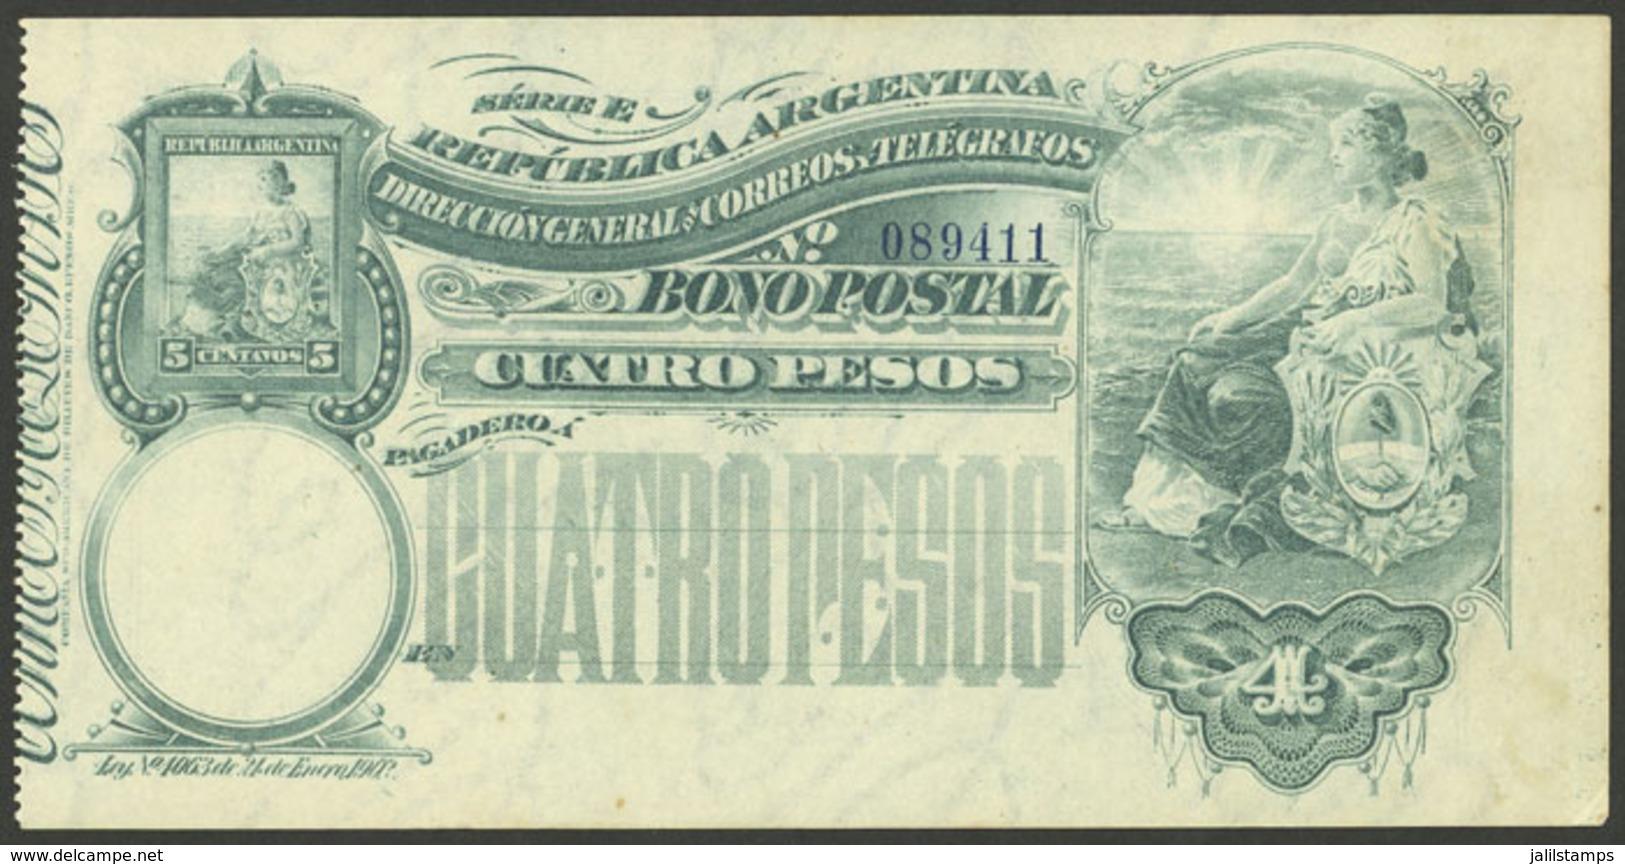 ARGENTINA: Postal Money Order GJ.BOP- 12, 1904 Seated Liberty 4P., Unused, Without Slip, VF Quality, Rare! - Postal Stationery